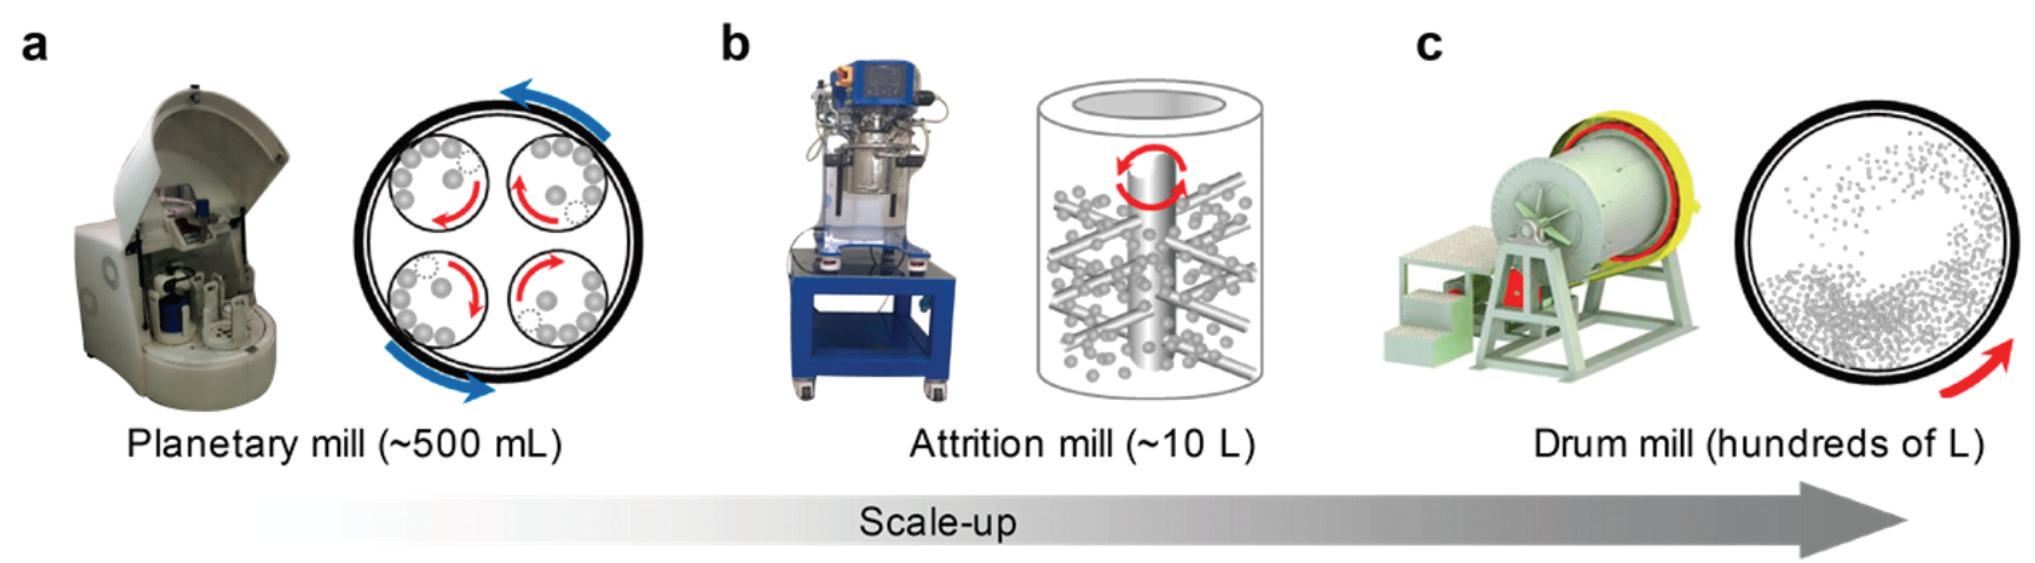 Scale-up 단계에 따른 (a) Planetary mill, (b) Attrition mill, (c) Drum mill에서의 마그네슘 볼밀 공정